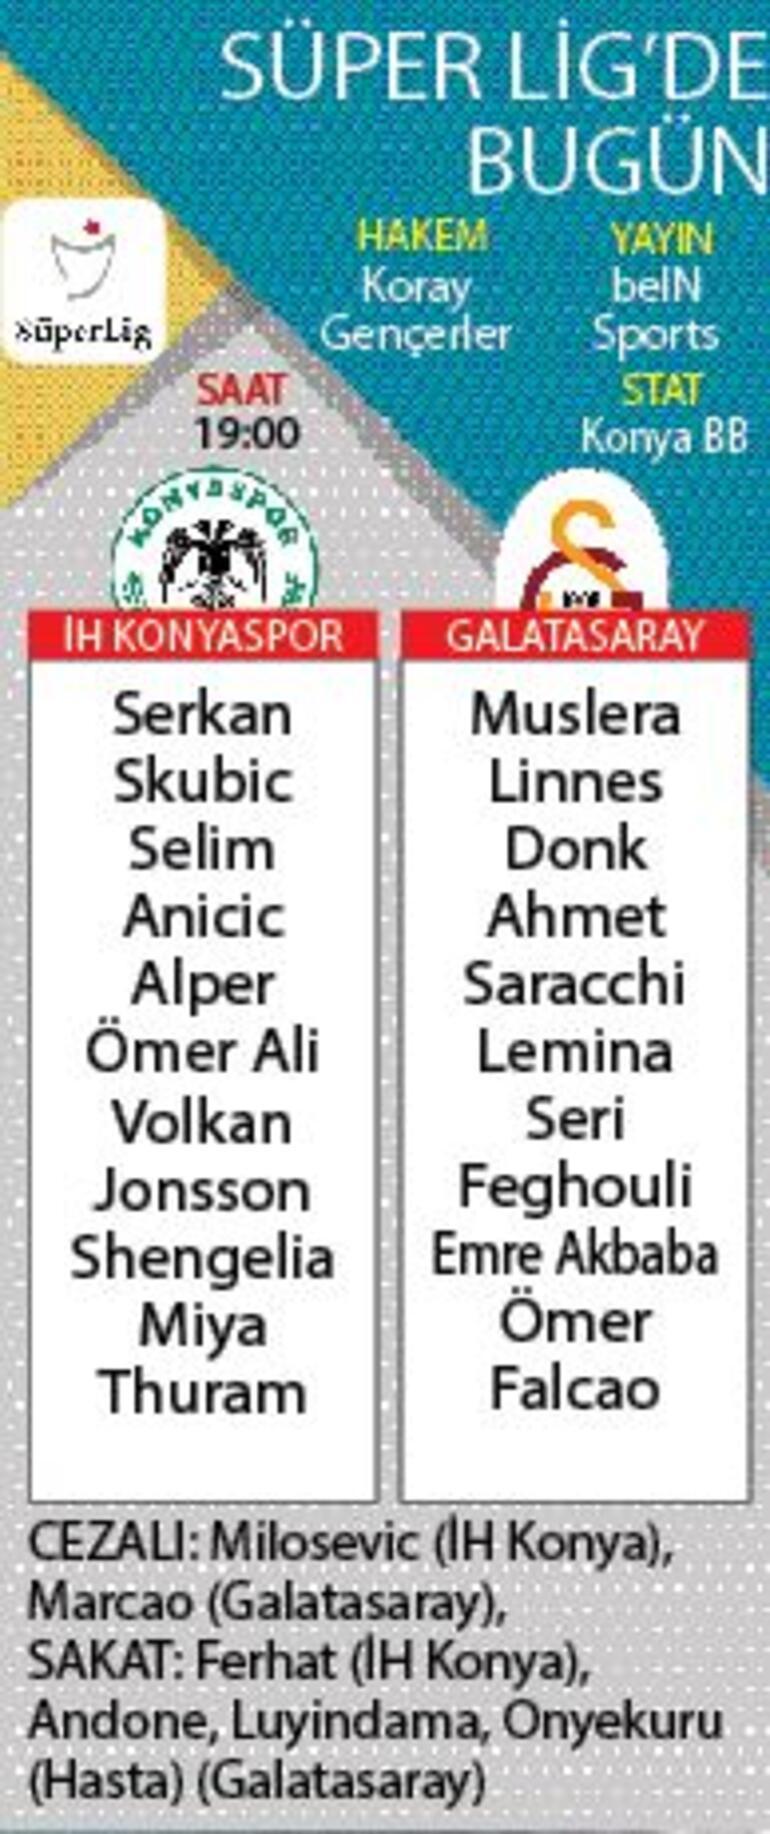 Galatasaray 10 yabancıyla gitti Konyaspor maçı...